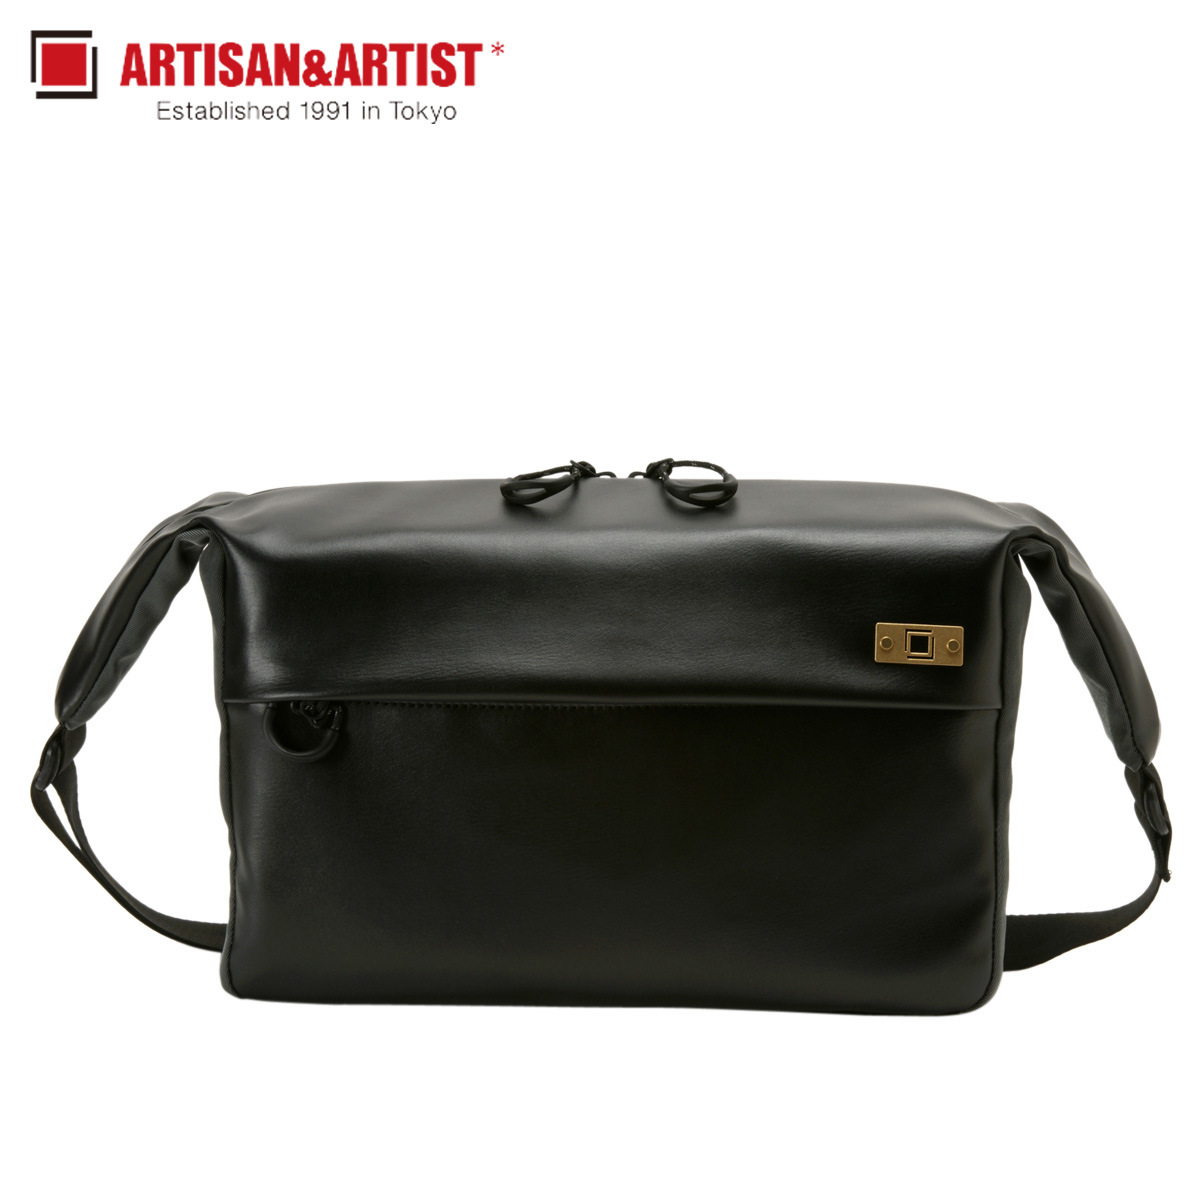 ARTISAN&ARTIST アルティザン&アーティスト ショルダーバッグ カメラバッグ バッグ メンズ BASALT SHOULDER BAG ブラック 黒 ACAM-BS0002:シュガーオンラインショップ